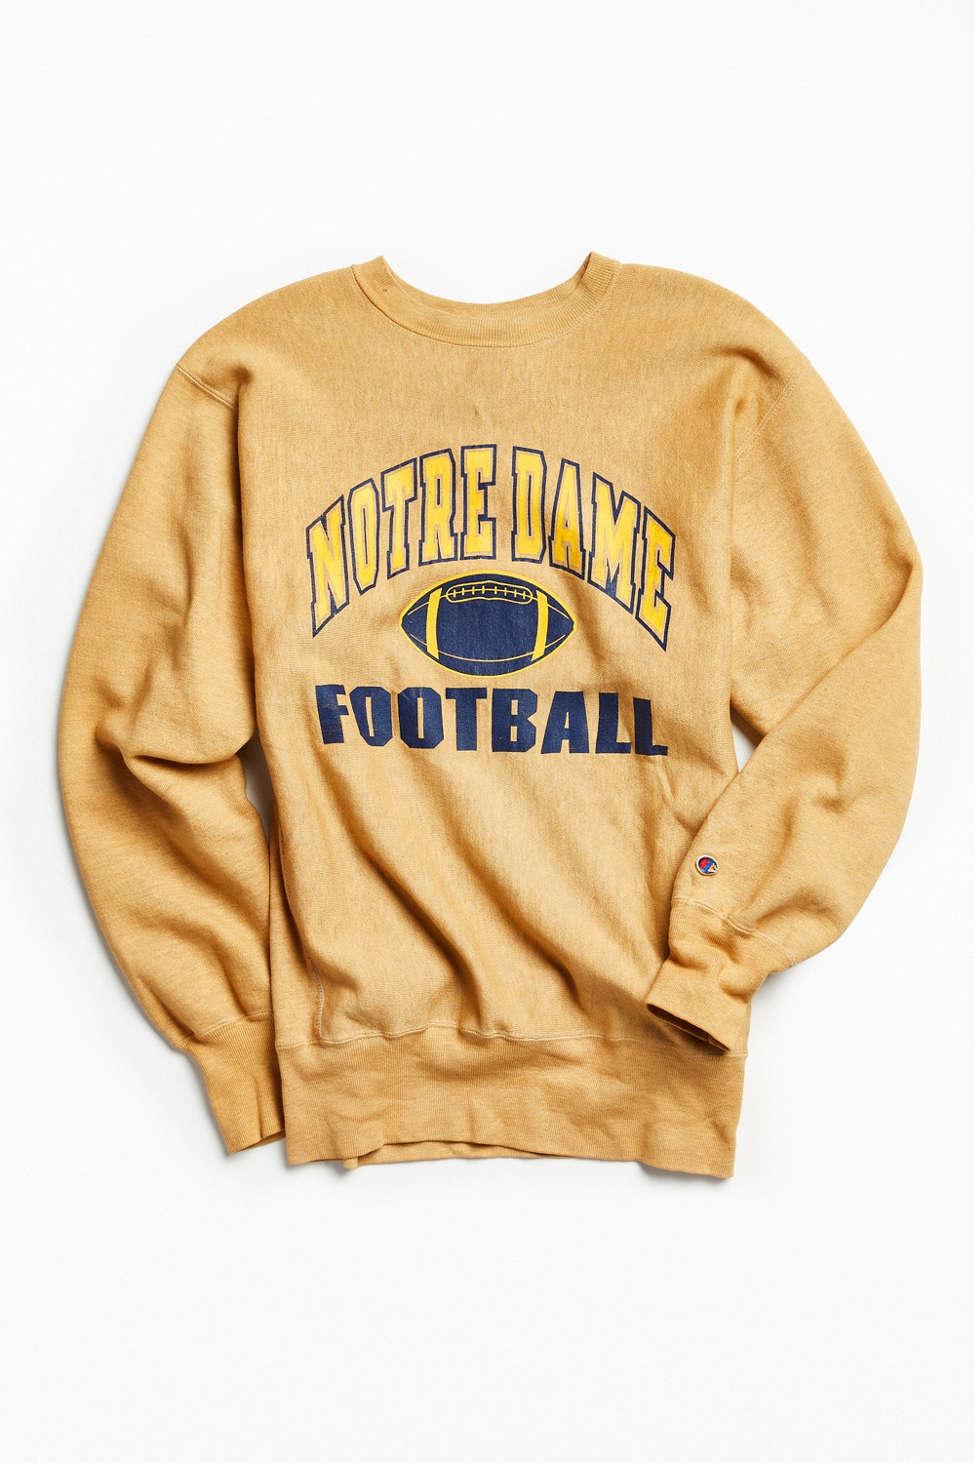 Vintage Notre Dame Crew Neck Sweatshirt Urban Outfitters